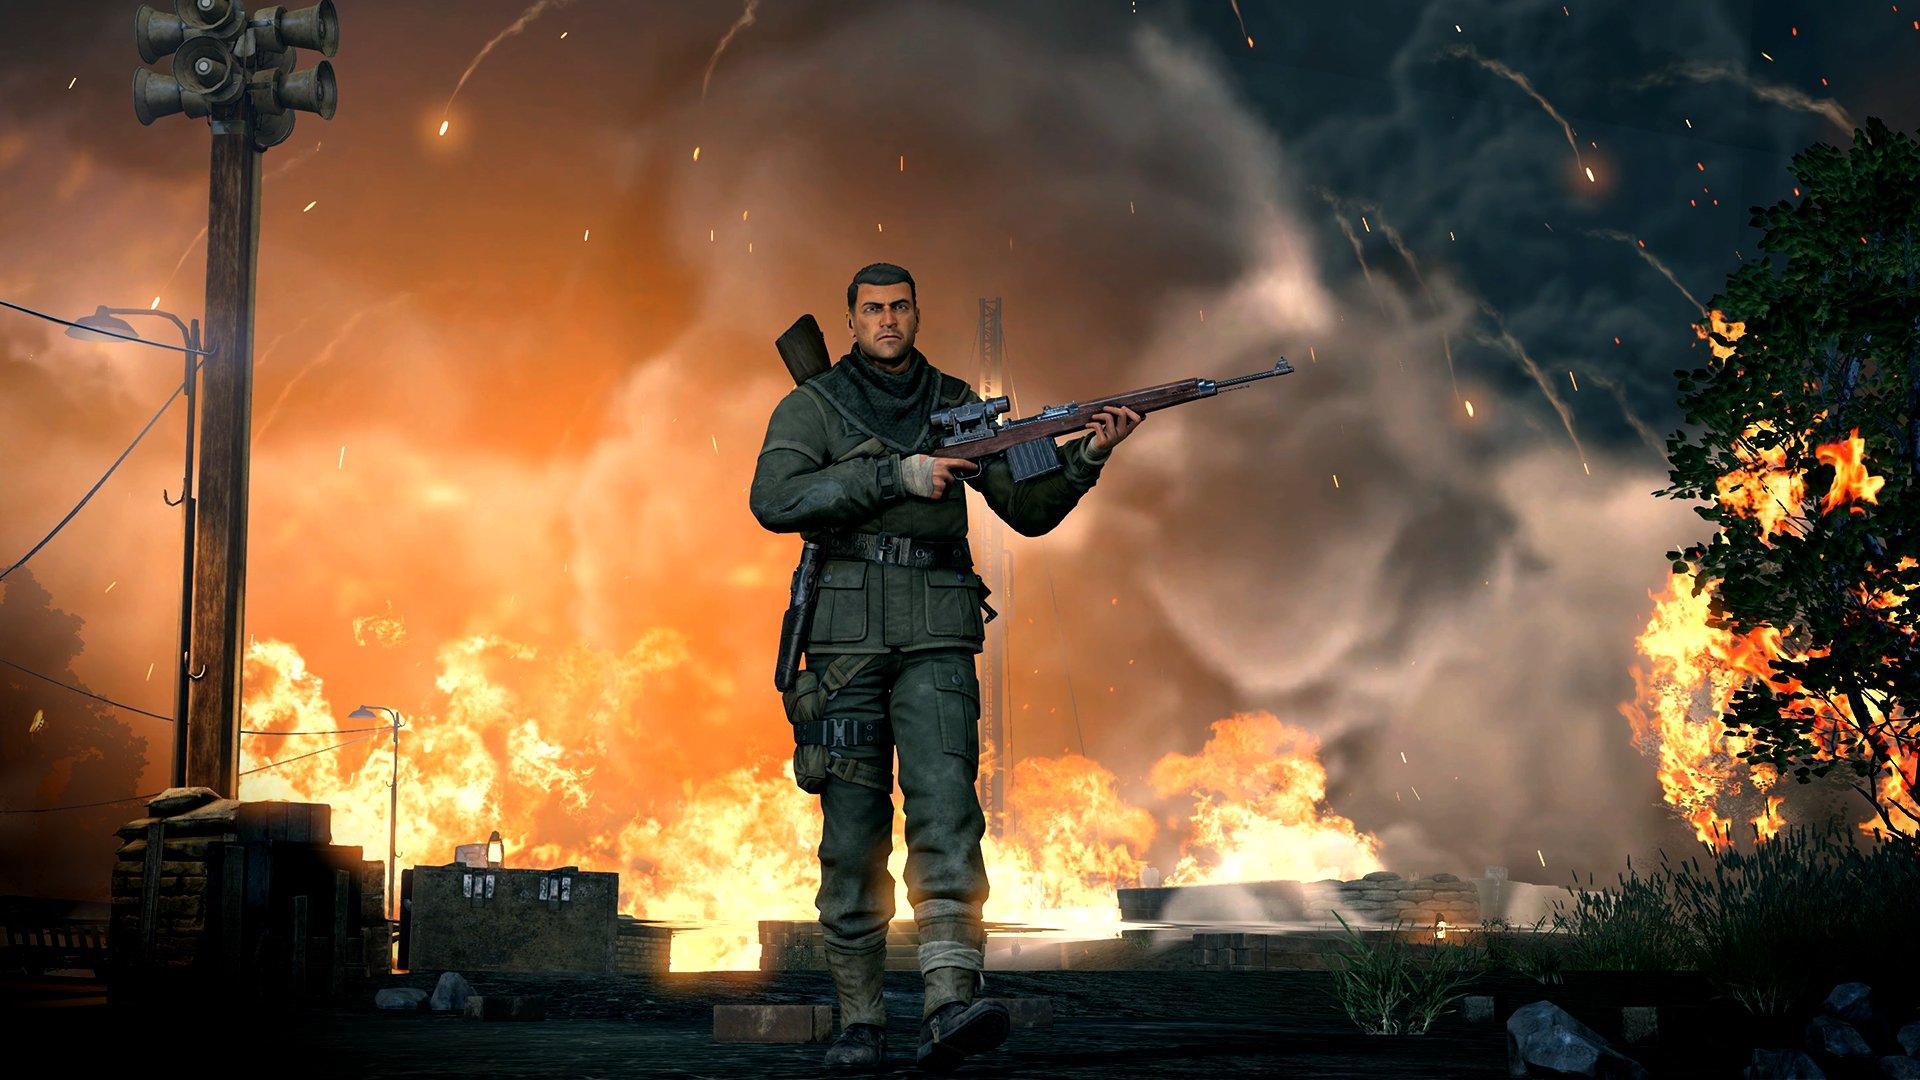 Sniper Elite V2 Cibles remastérisées Date de sortie possible